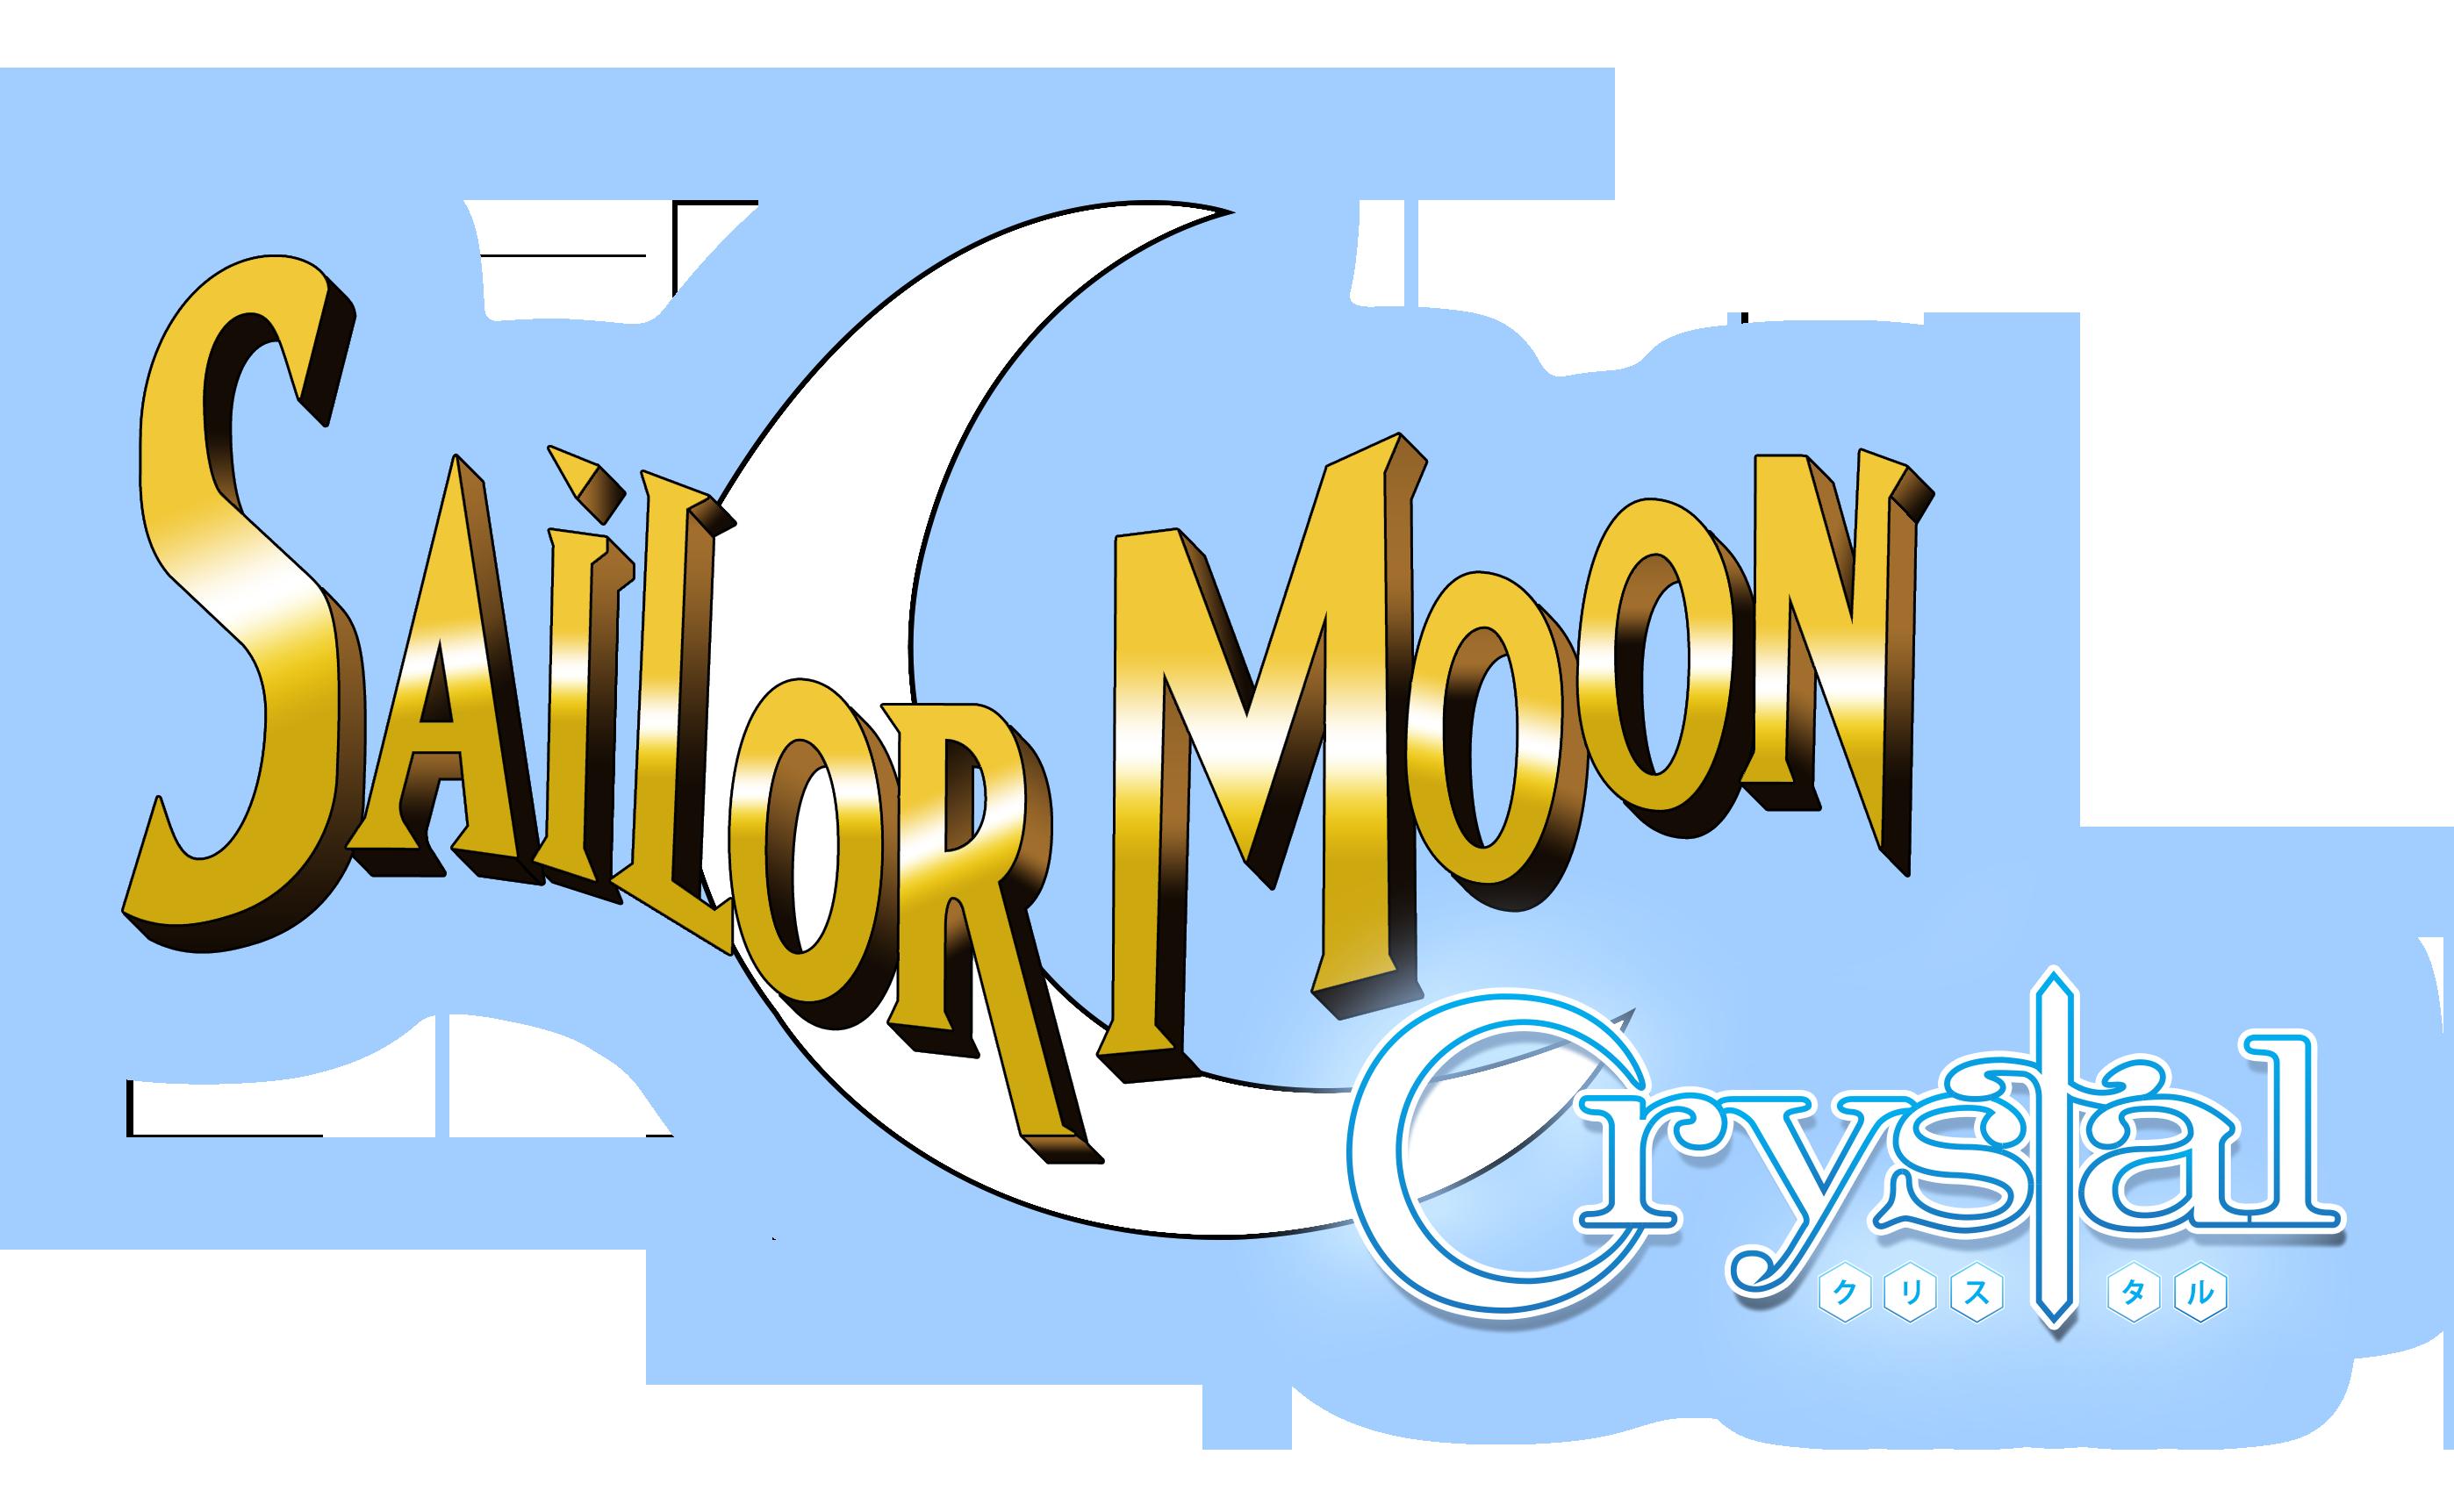 Sailor Moon Png Logo Hd Png Download Sailor Moon Sailor Png